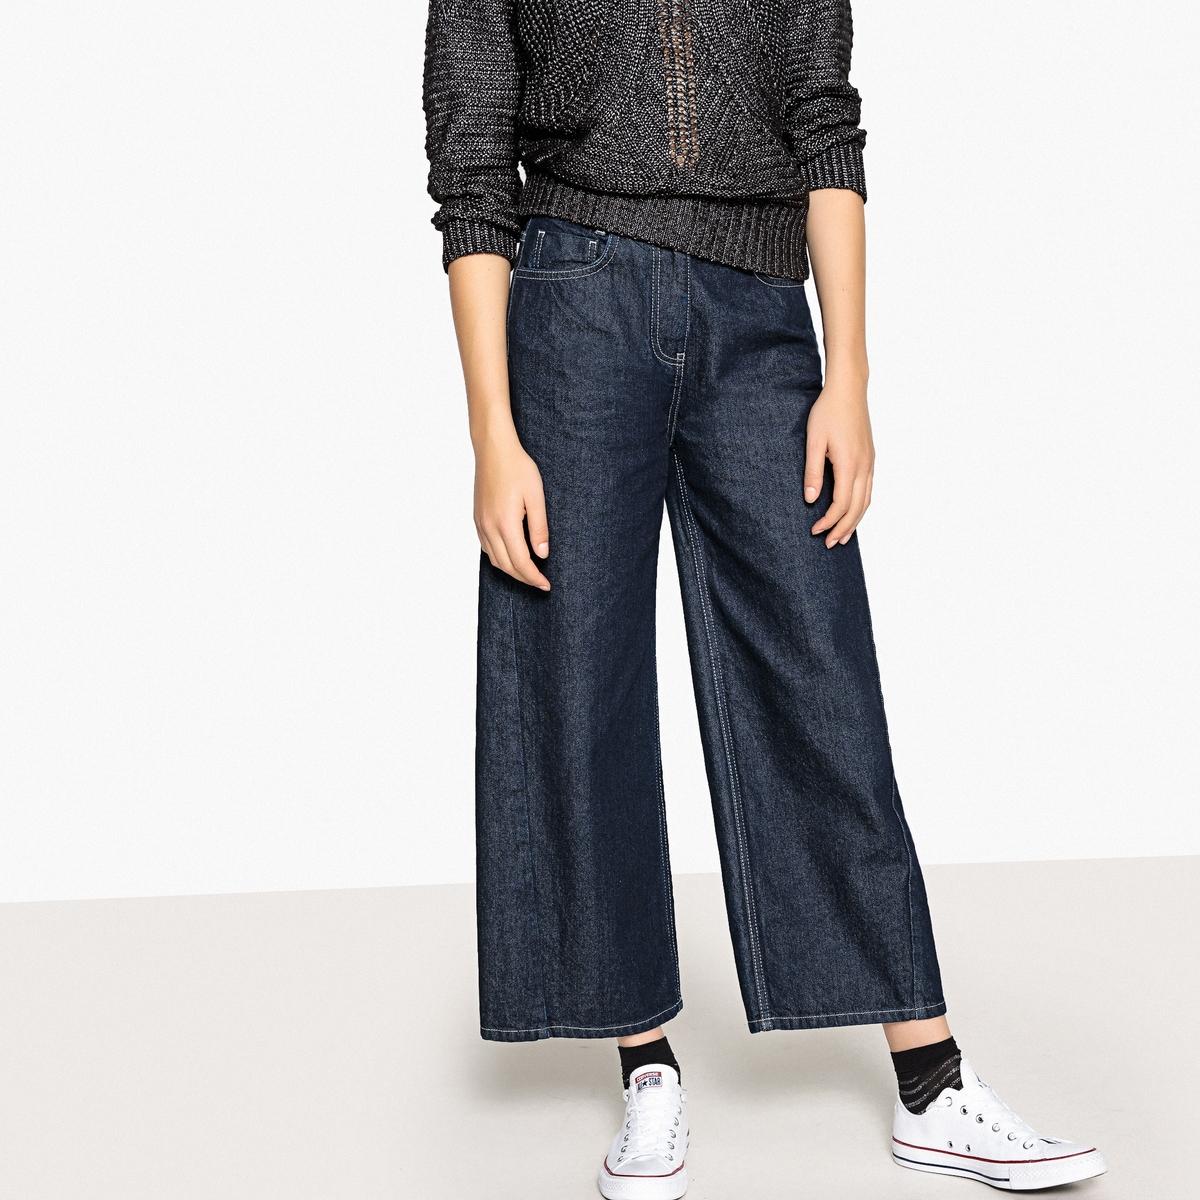 Falda pantalón vaquera